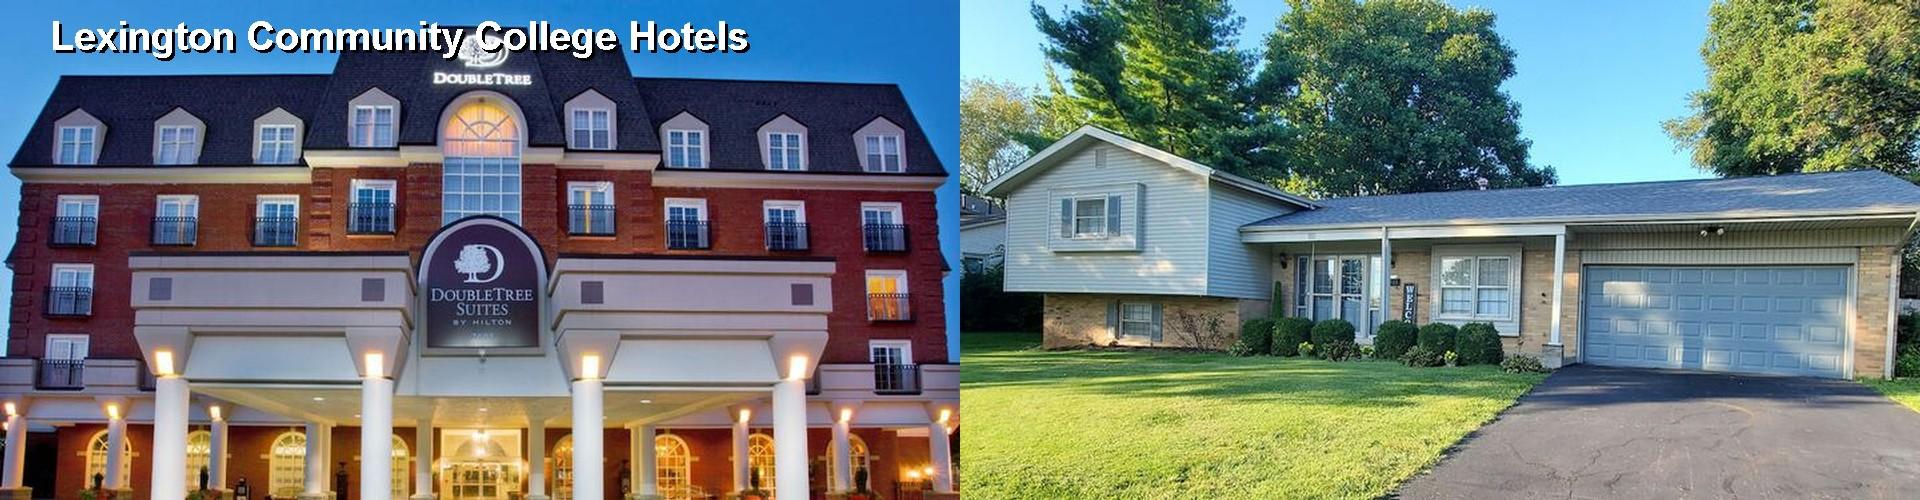 5 Best Hotels Near Lexington Community College